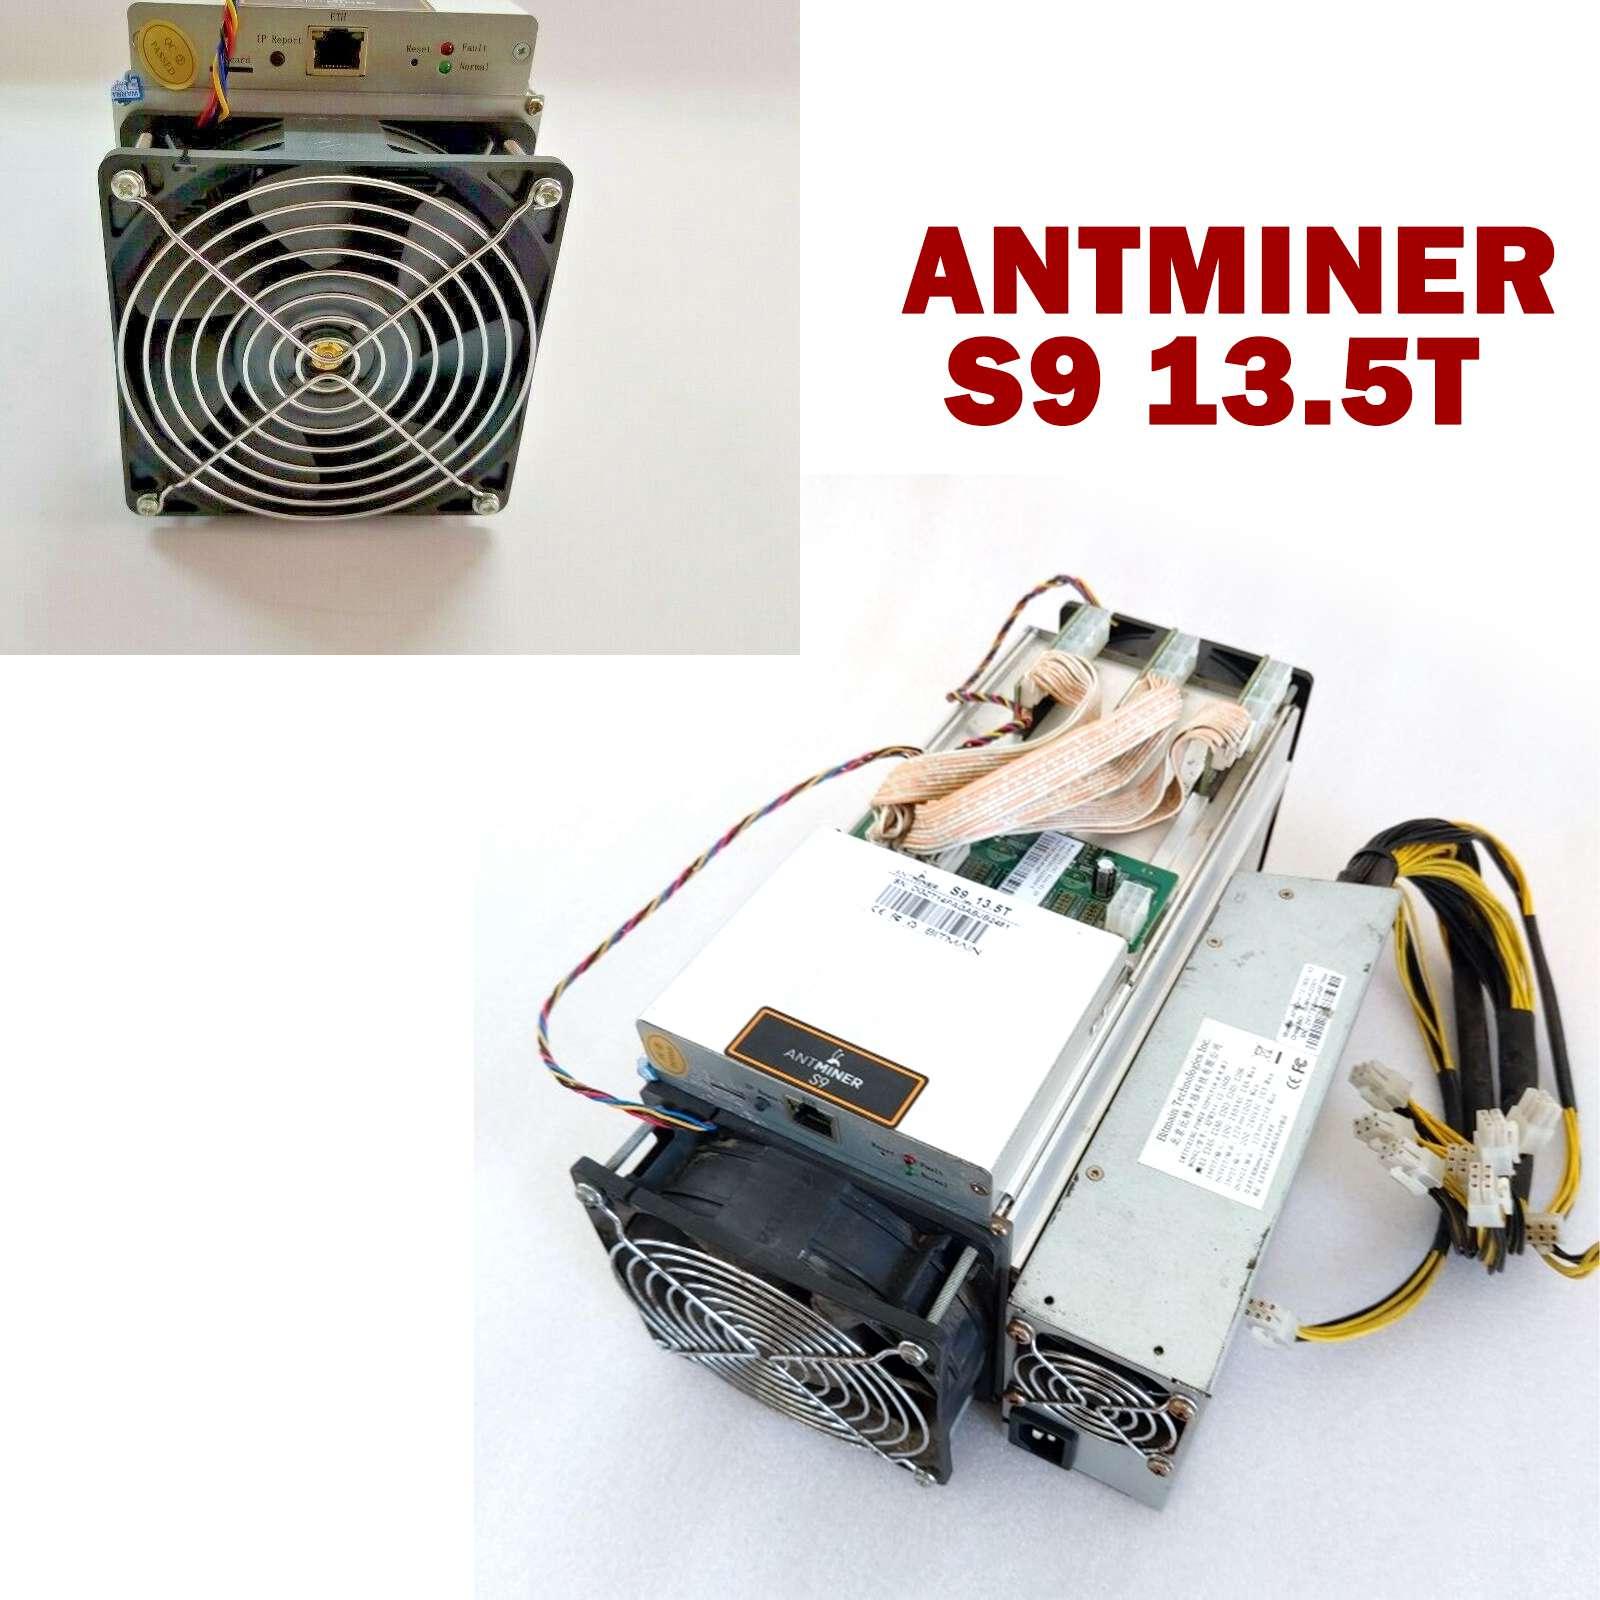 BTC BCH عامل منجم AntMiner S9 13.5T مع جهاز تعدين بيتكوين امدادات الطاقة ASIC BTC BCH